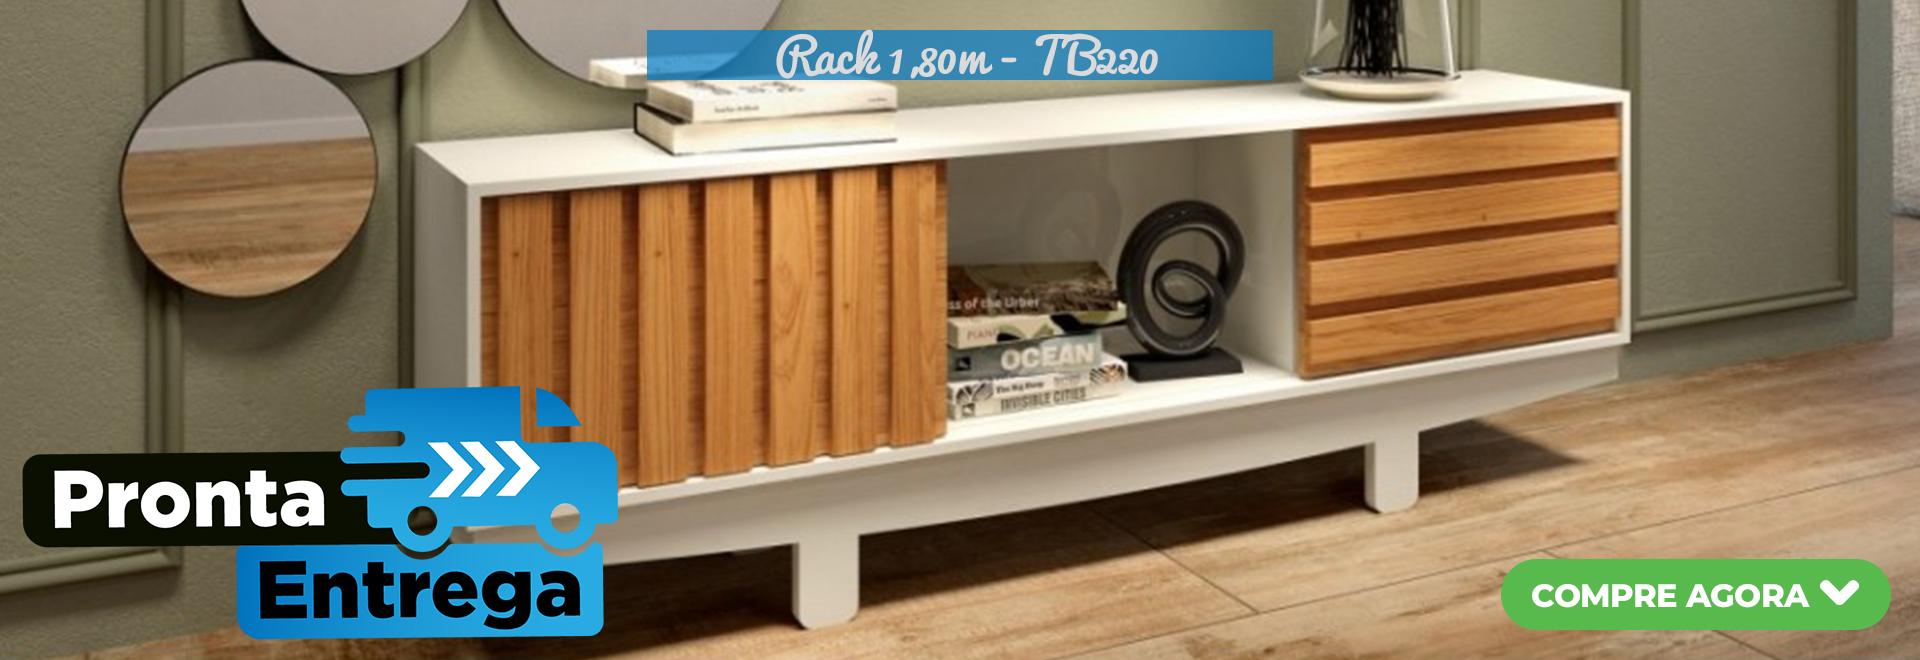 Rack 1,80m - TB220